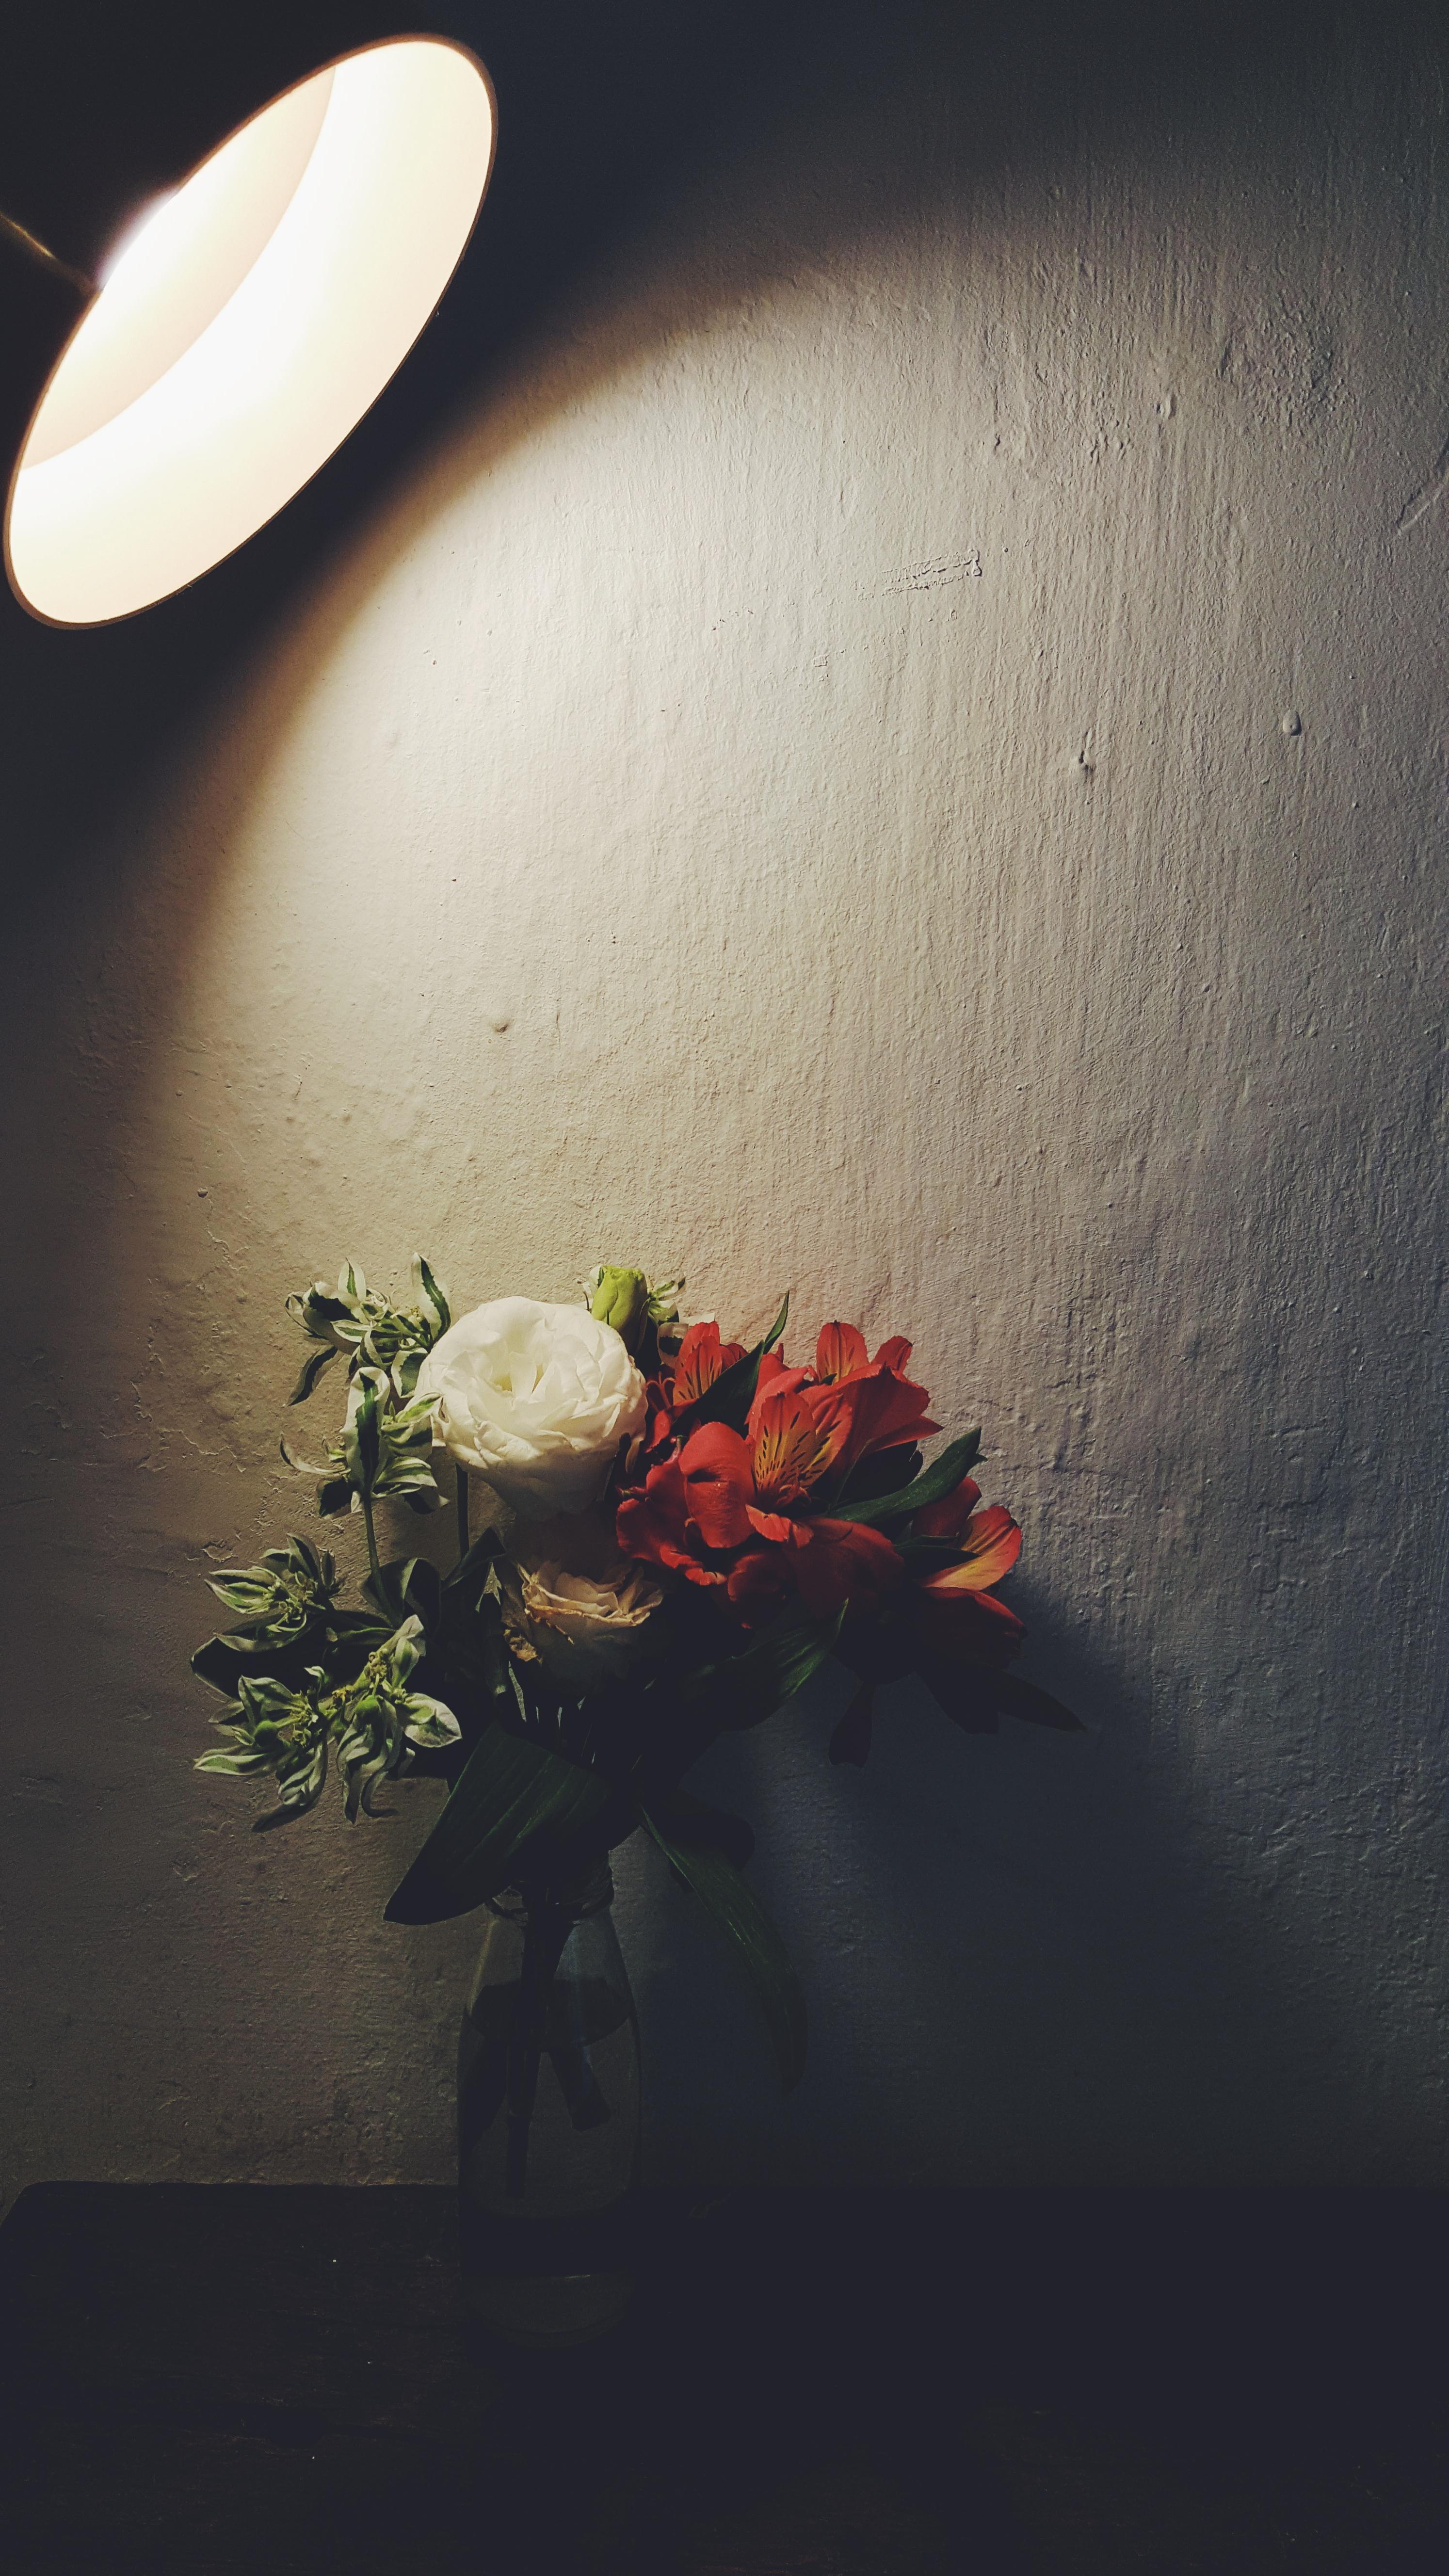 cahaya menanam putih fotografi daun bunga daun bunga hijau refleksi merah warna kegelapan hitam kuning penerangan